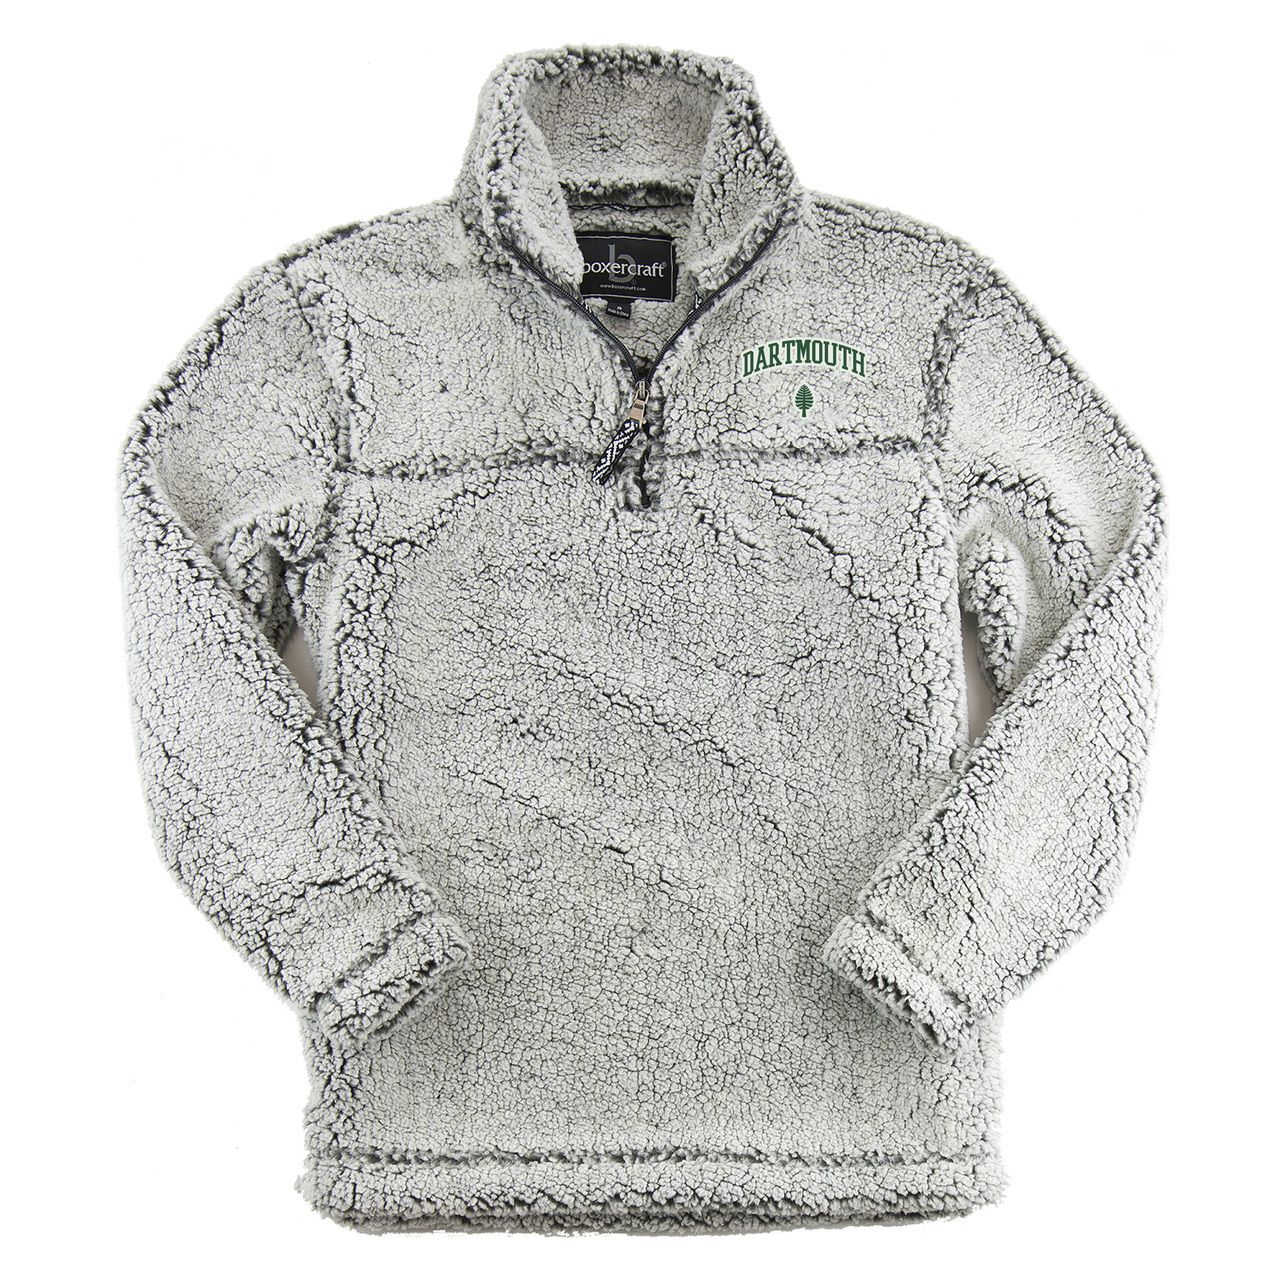 Dartmouth Sweatshirt Dartmouth College Sweatshirts Sweatsh Pullover Sherpa Pullover Quarter Zip Pullover [ 1280 x 1280 Pixel ]